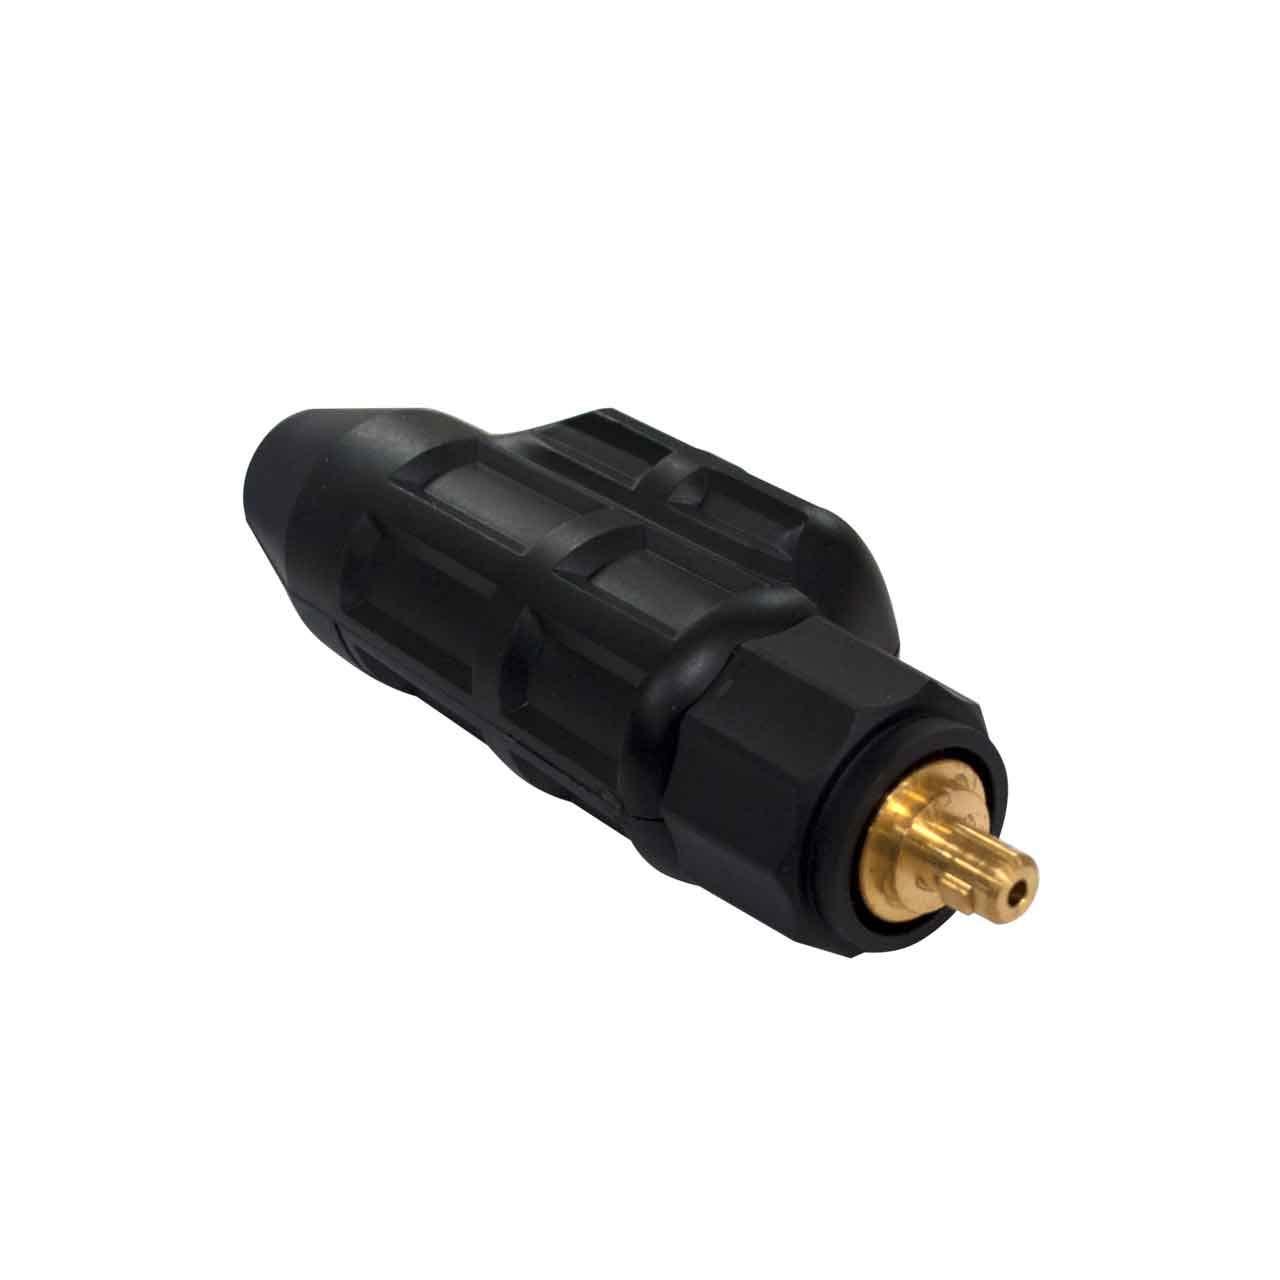 CK SL2-25M-24 SafeLoc Male Dinse 25M 3//8 CK24,80,90 Gas-Thru